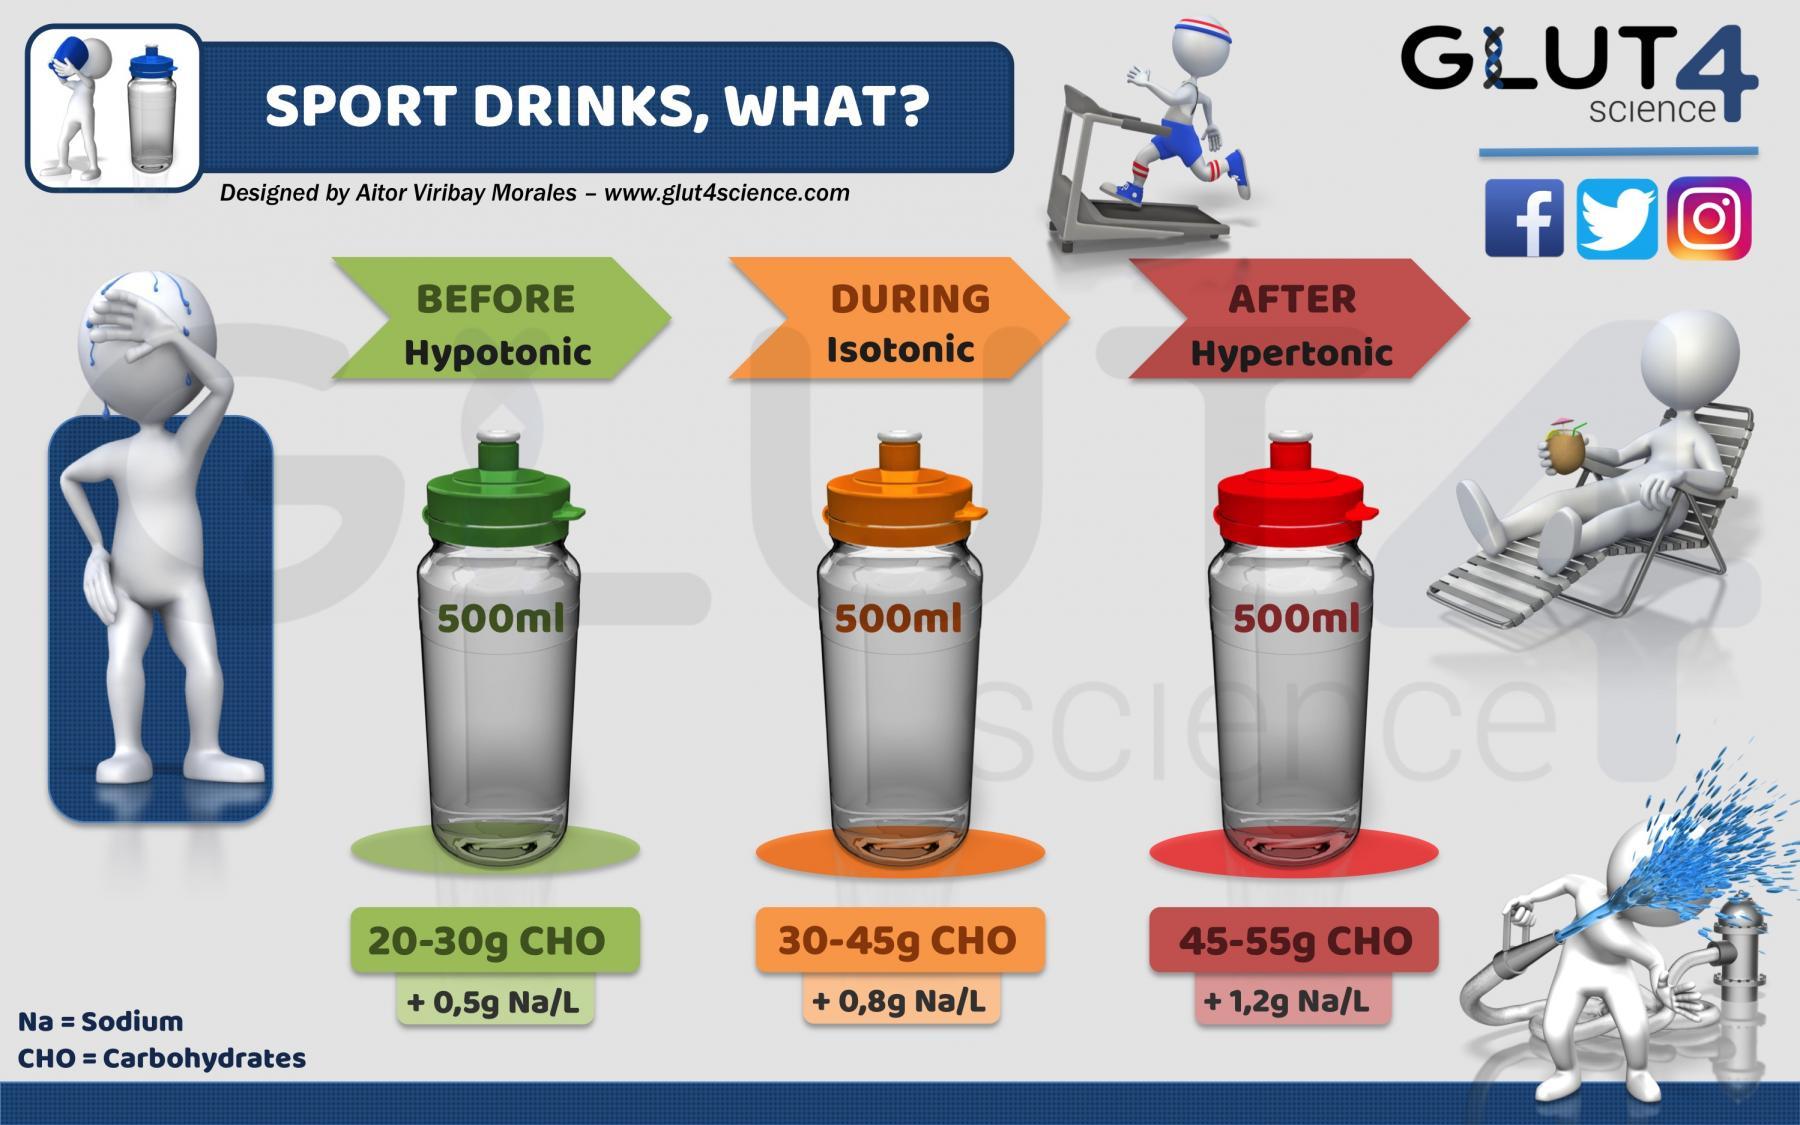 Sport Drinks: Hypotonic, Isotonic, Hypertonic